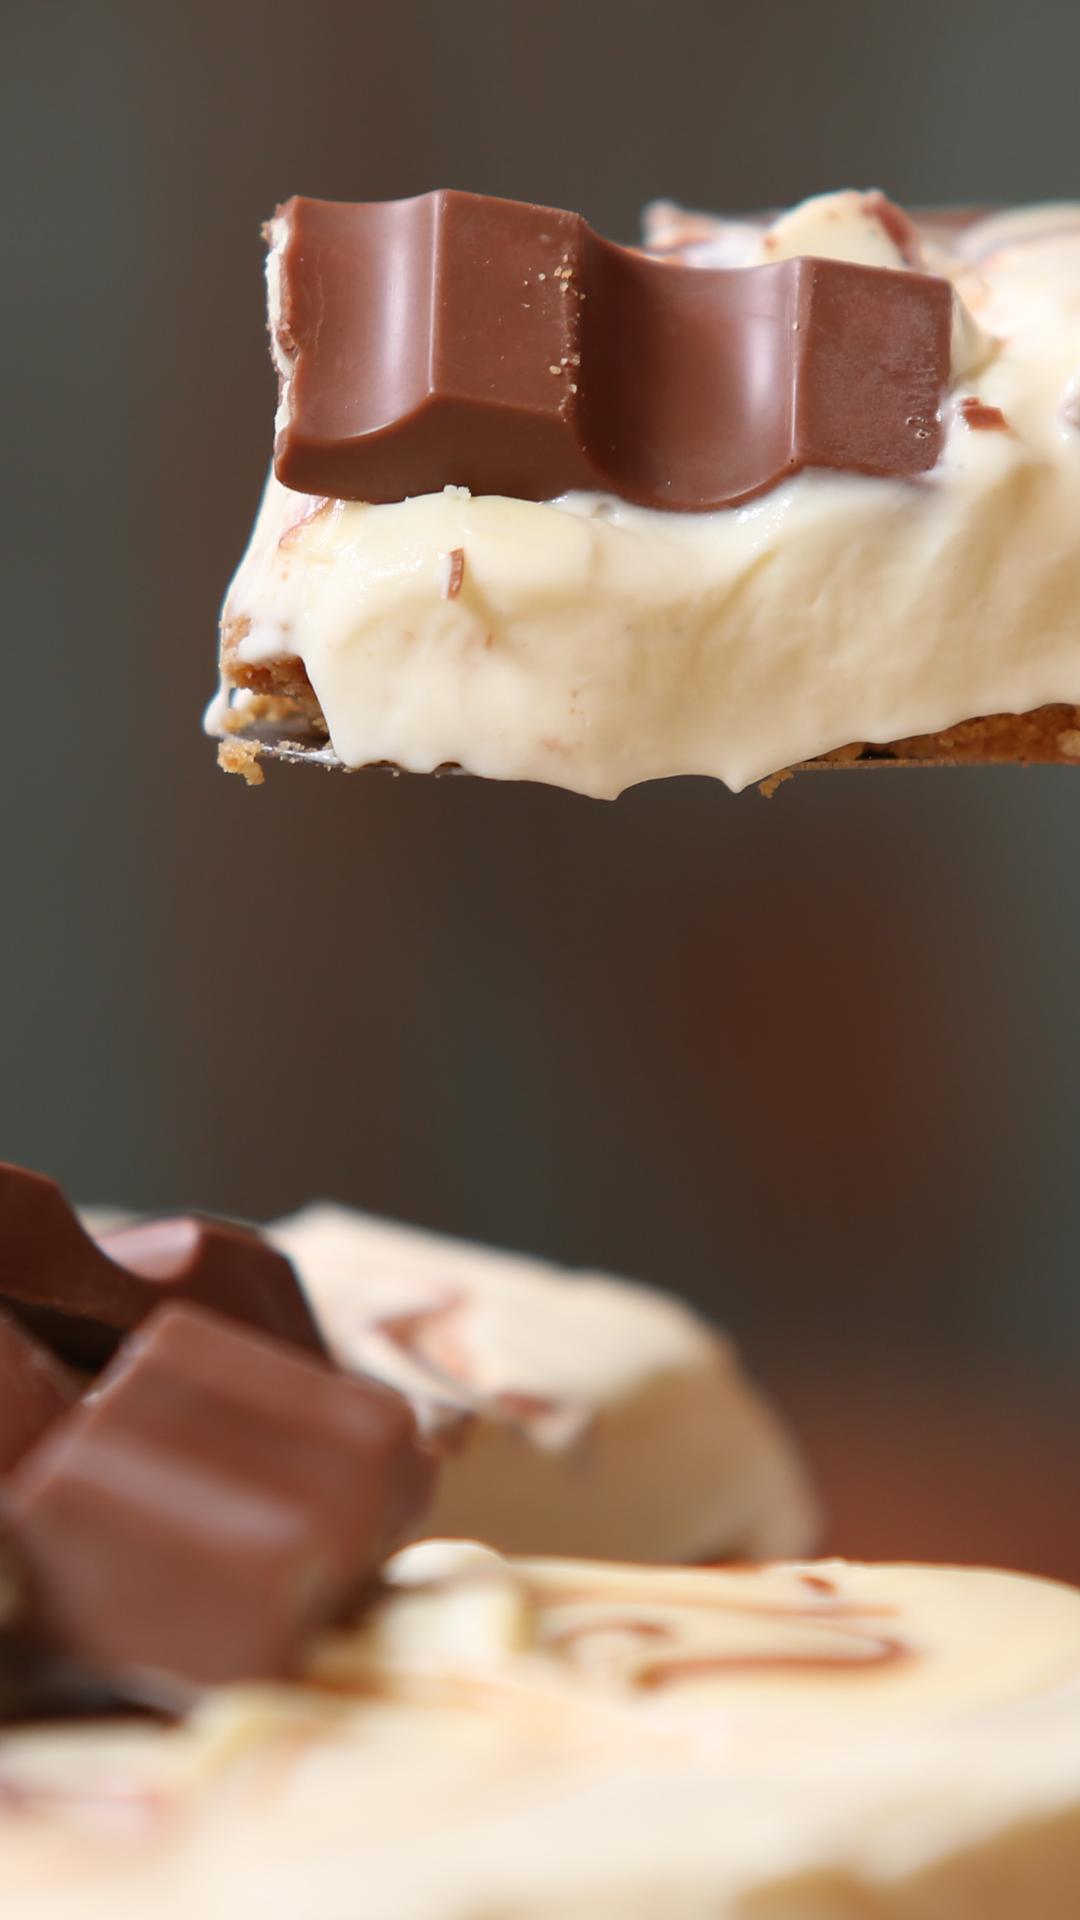 Cheesecake de Kinder - #Cheesecake #eatingclean #eatinghealthy #food #foodcooking #foodideas #foodrecipes #healthyrecipes #Kinder #recipes